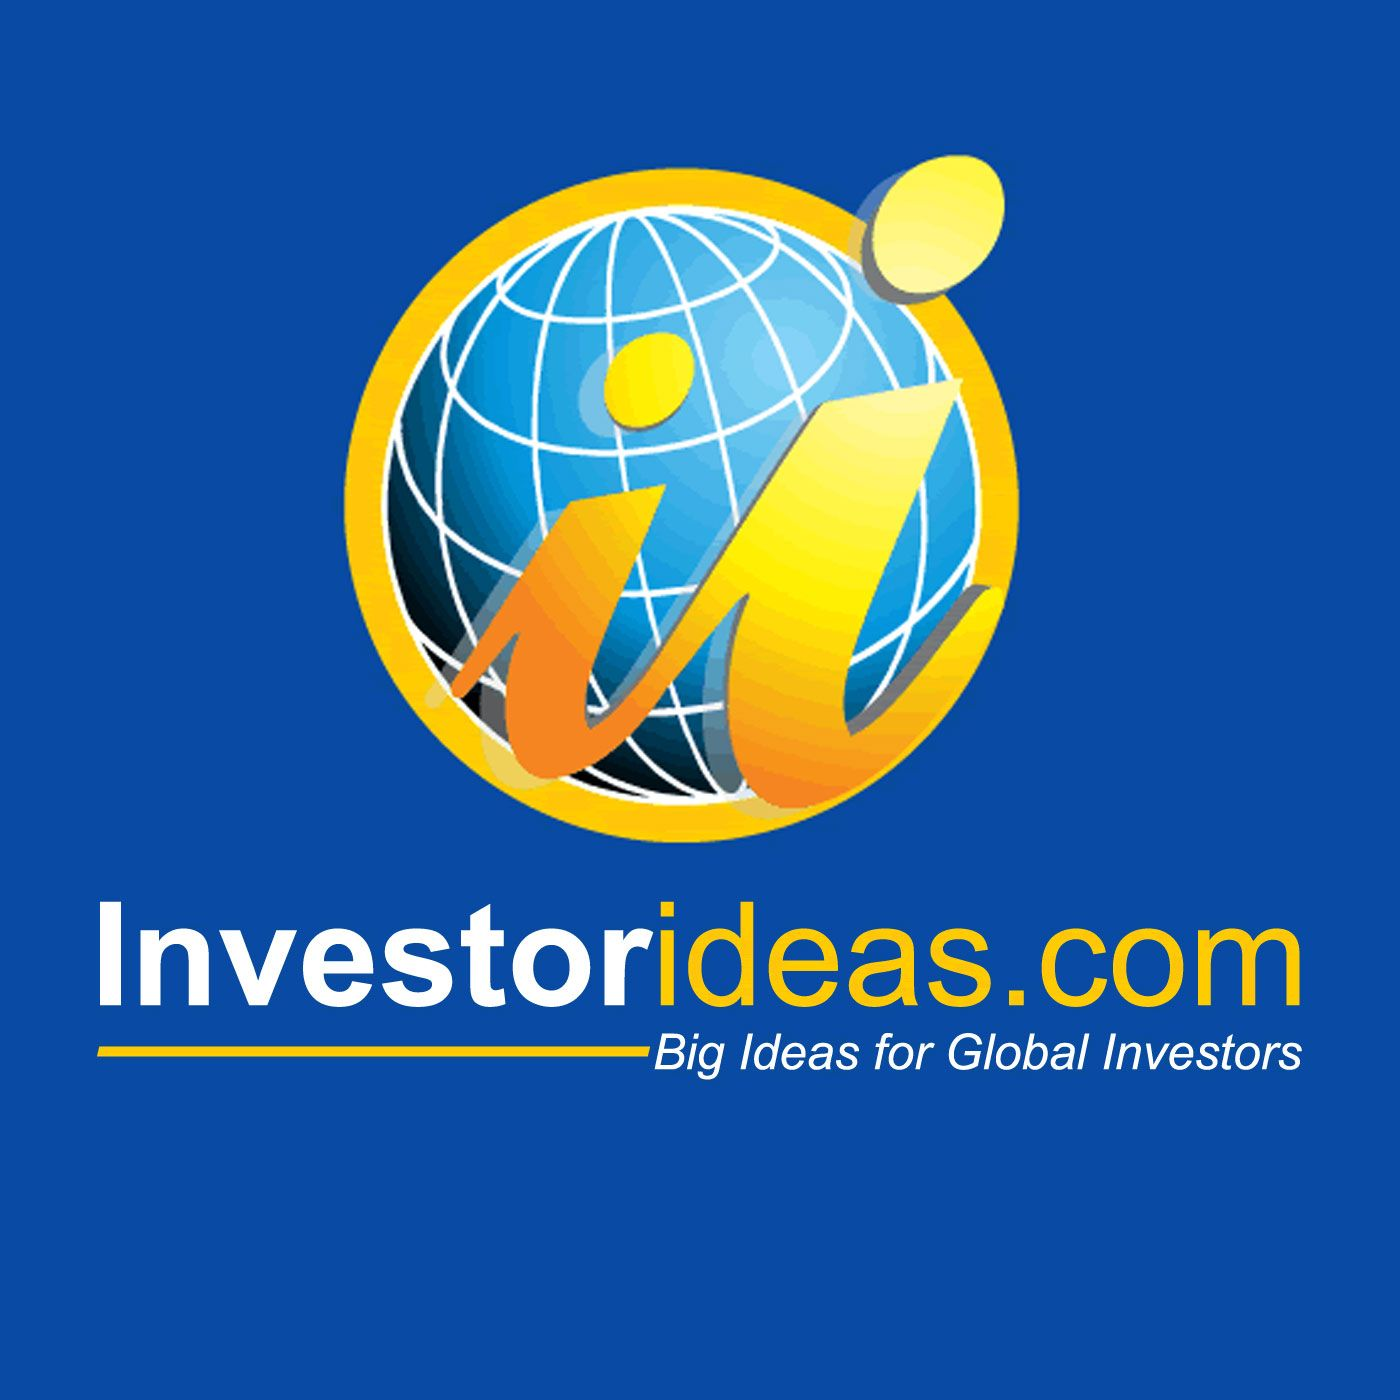 Crypto Corner Podcast 678: Stocks discussed: (NasdaqGS: PYPL) (NasdaqGS: COIN) (TSXV: BNXA)